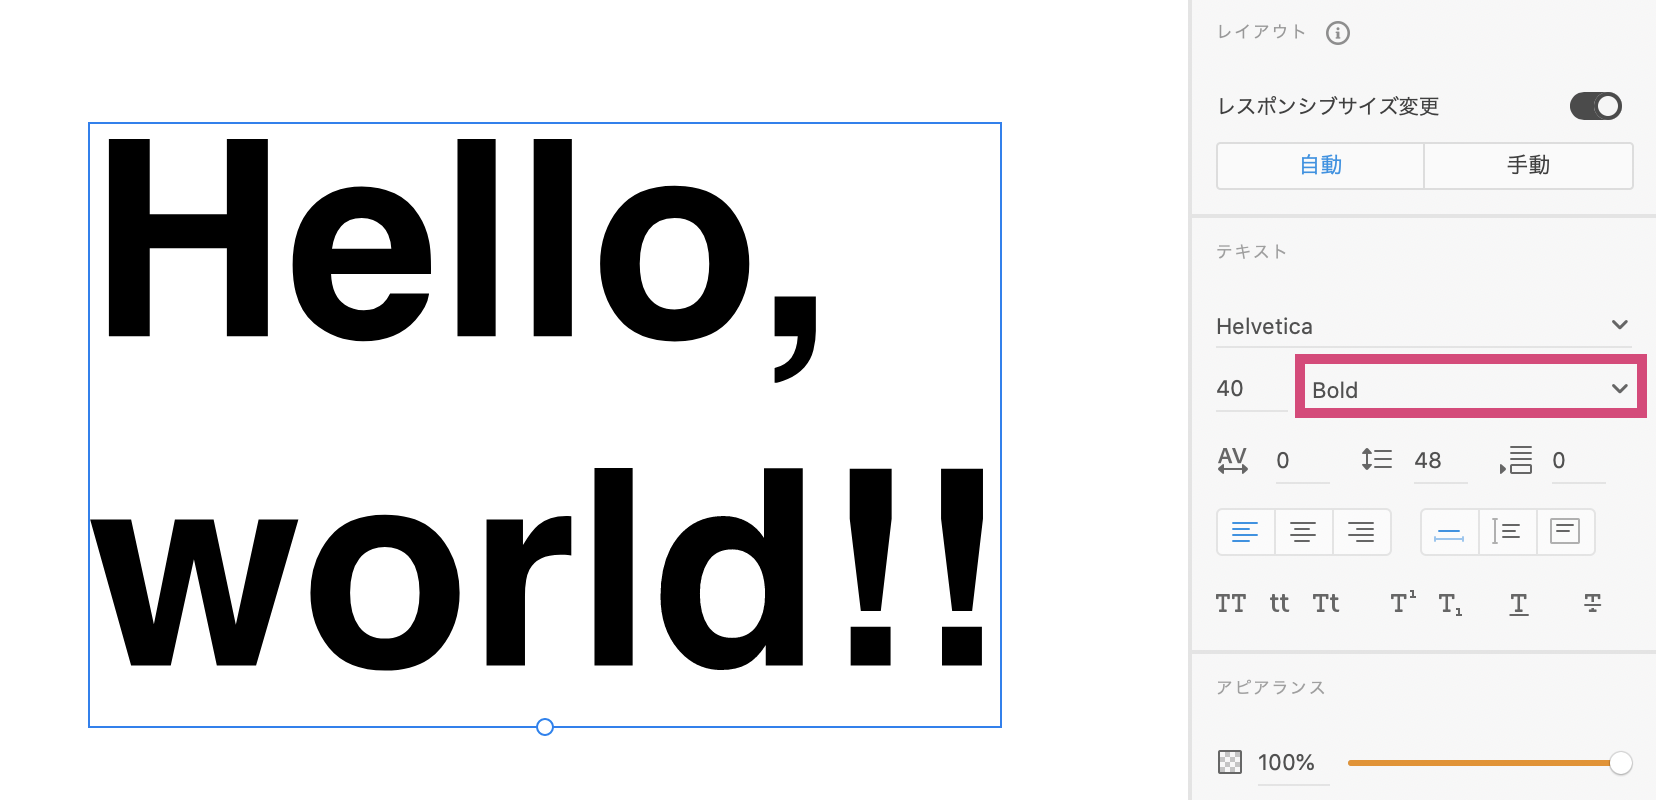 font-weight